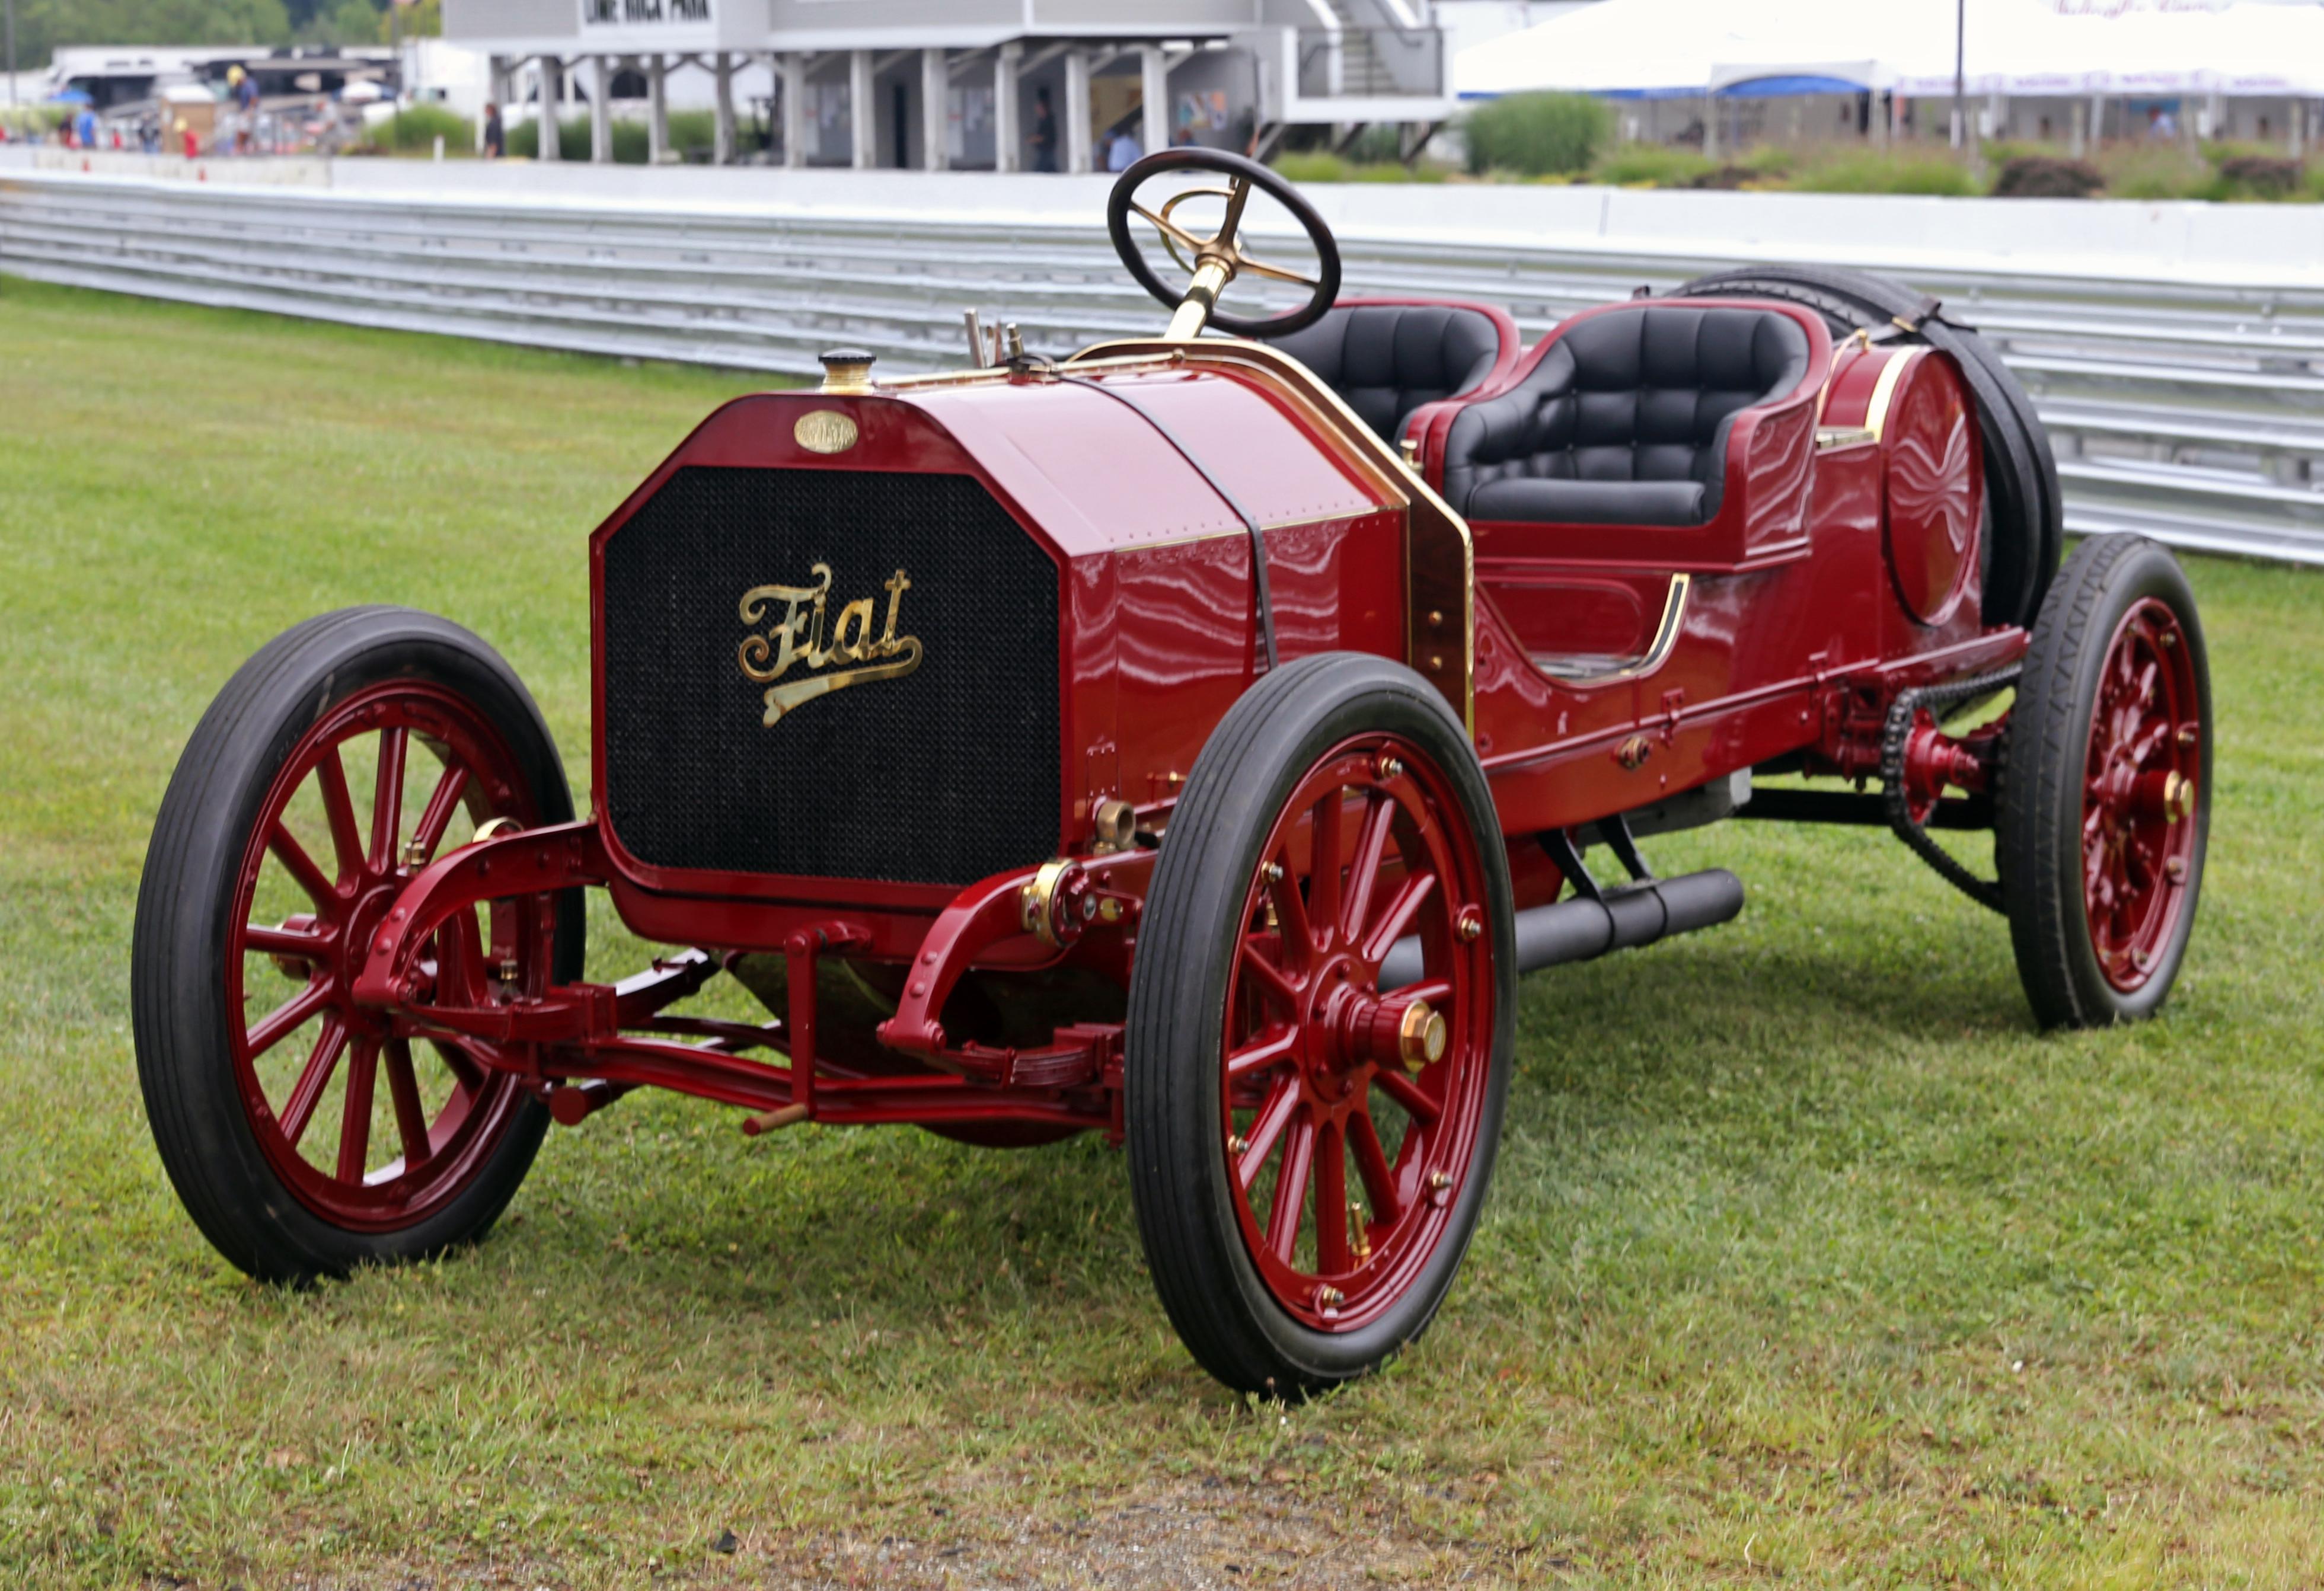 file 1907 fiat 28 40 hp targa florio corsa lime rock jpg wikimedia commons. Black Bedroom Furniture Sets. Home Design Ideas